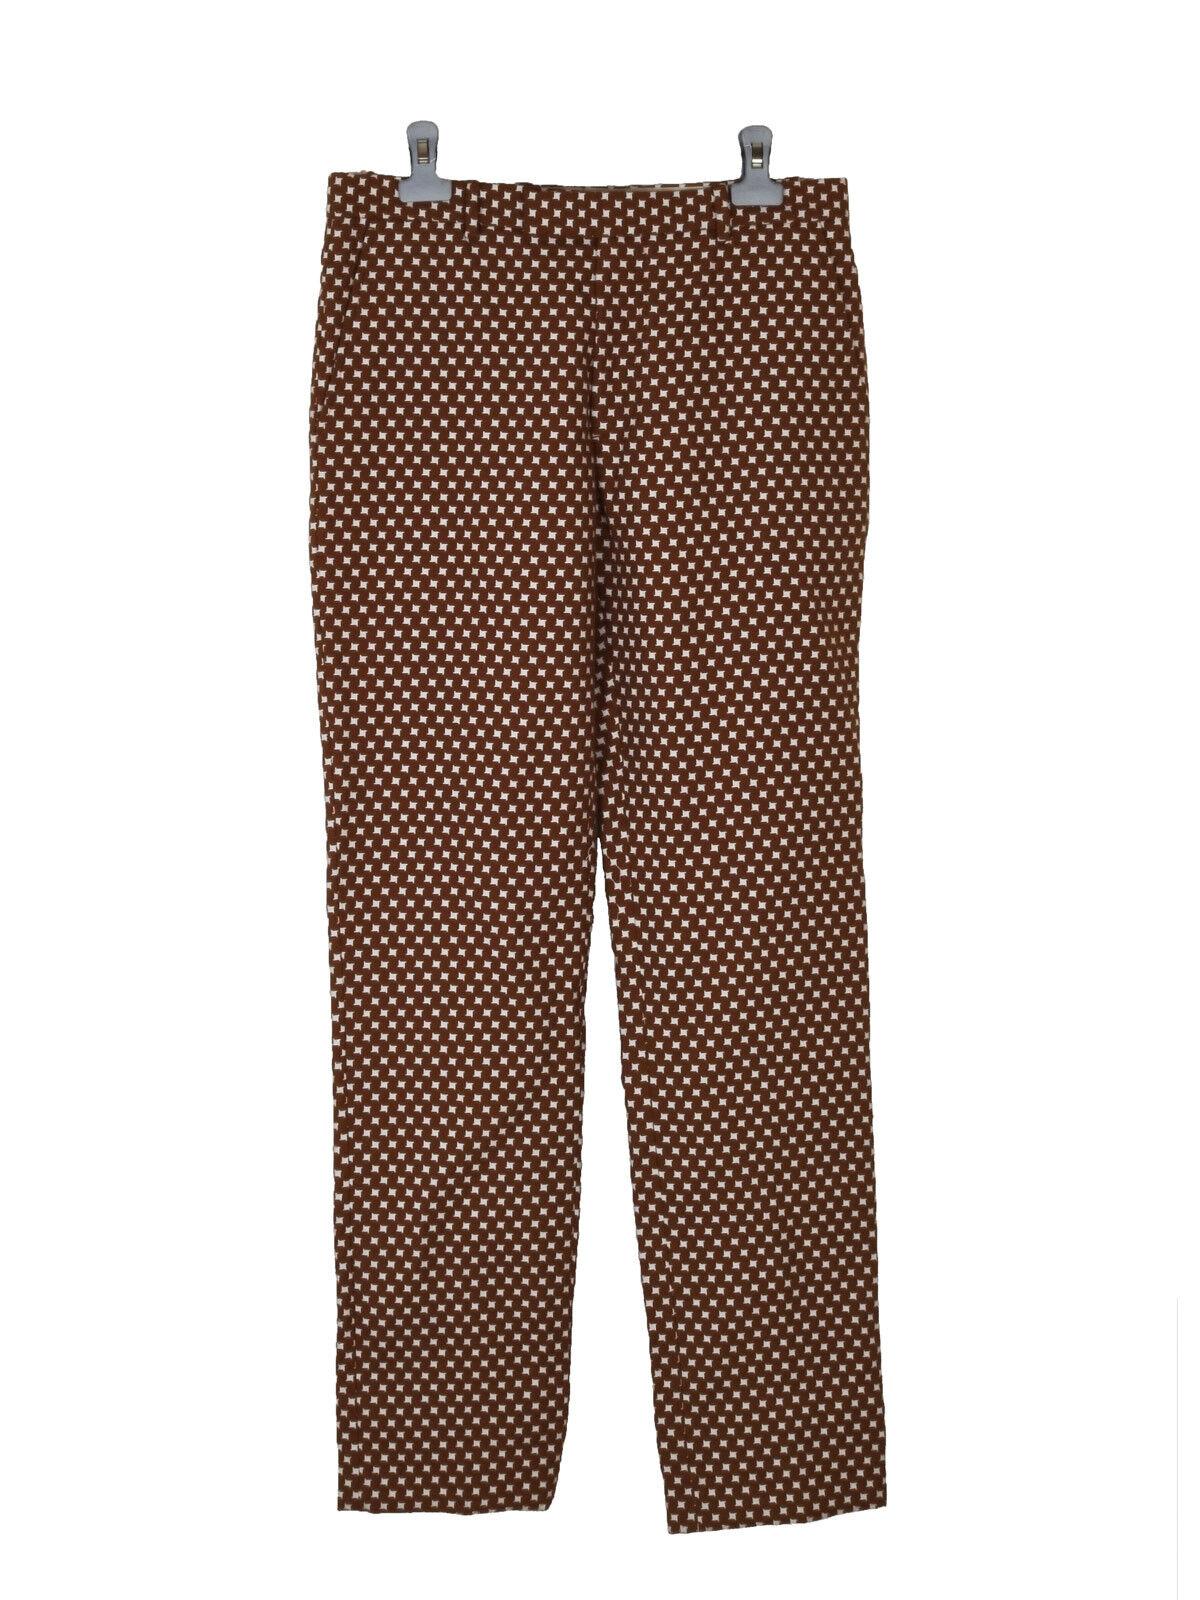 NEU MARNI Muster Gold-braun Baumwollgemisch Hose